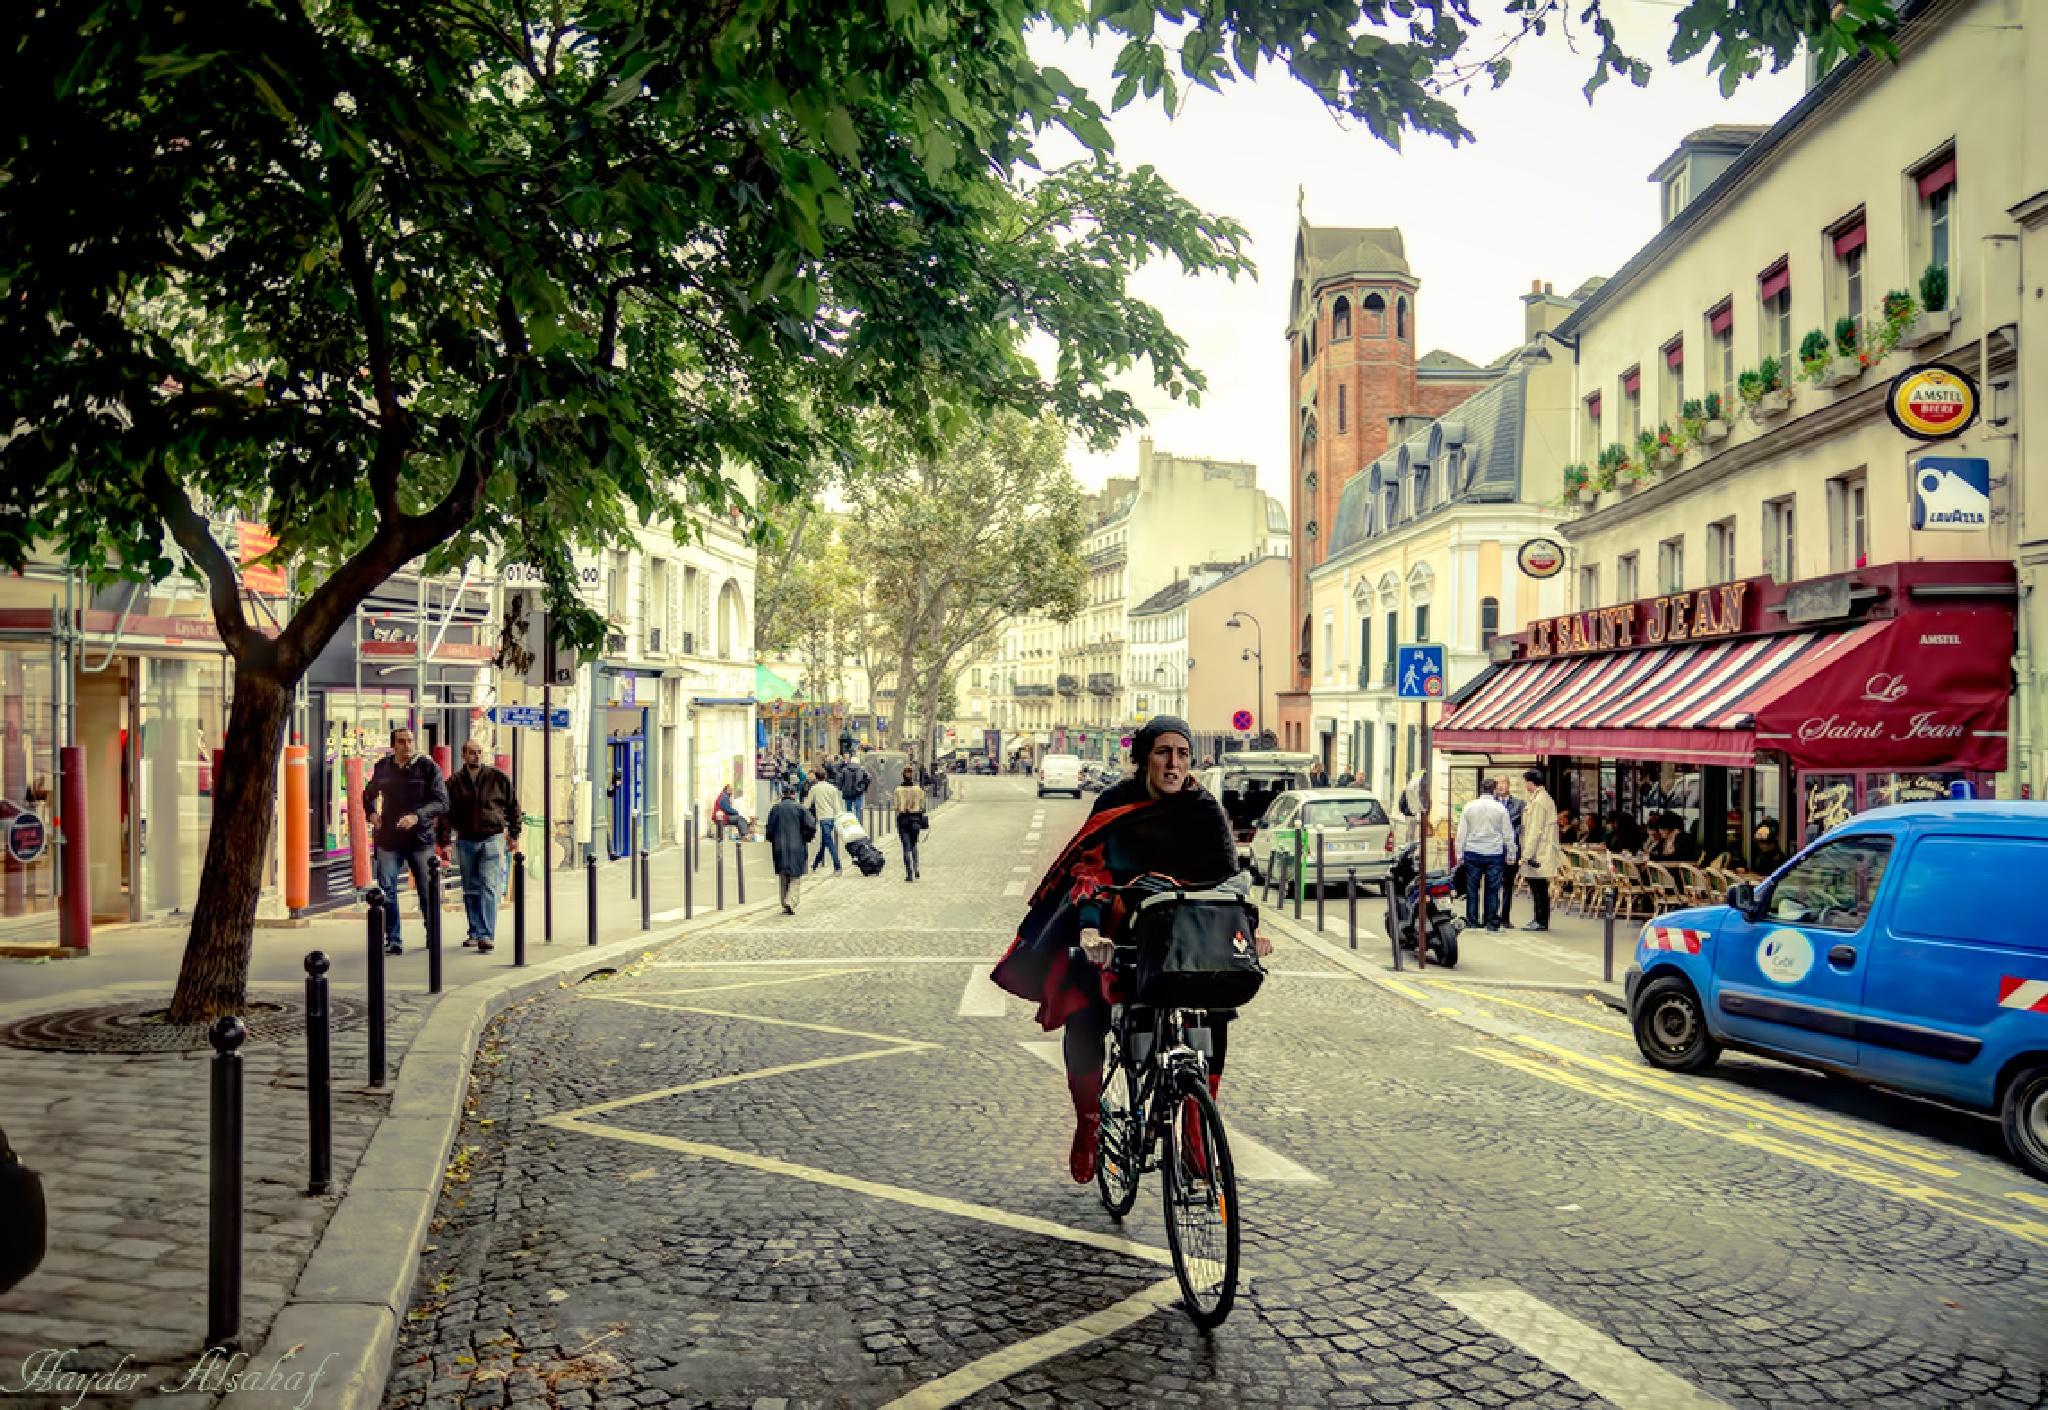 Parisian street by Hayder Alsahaf